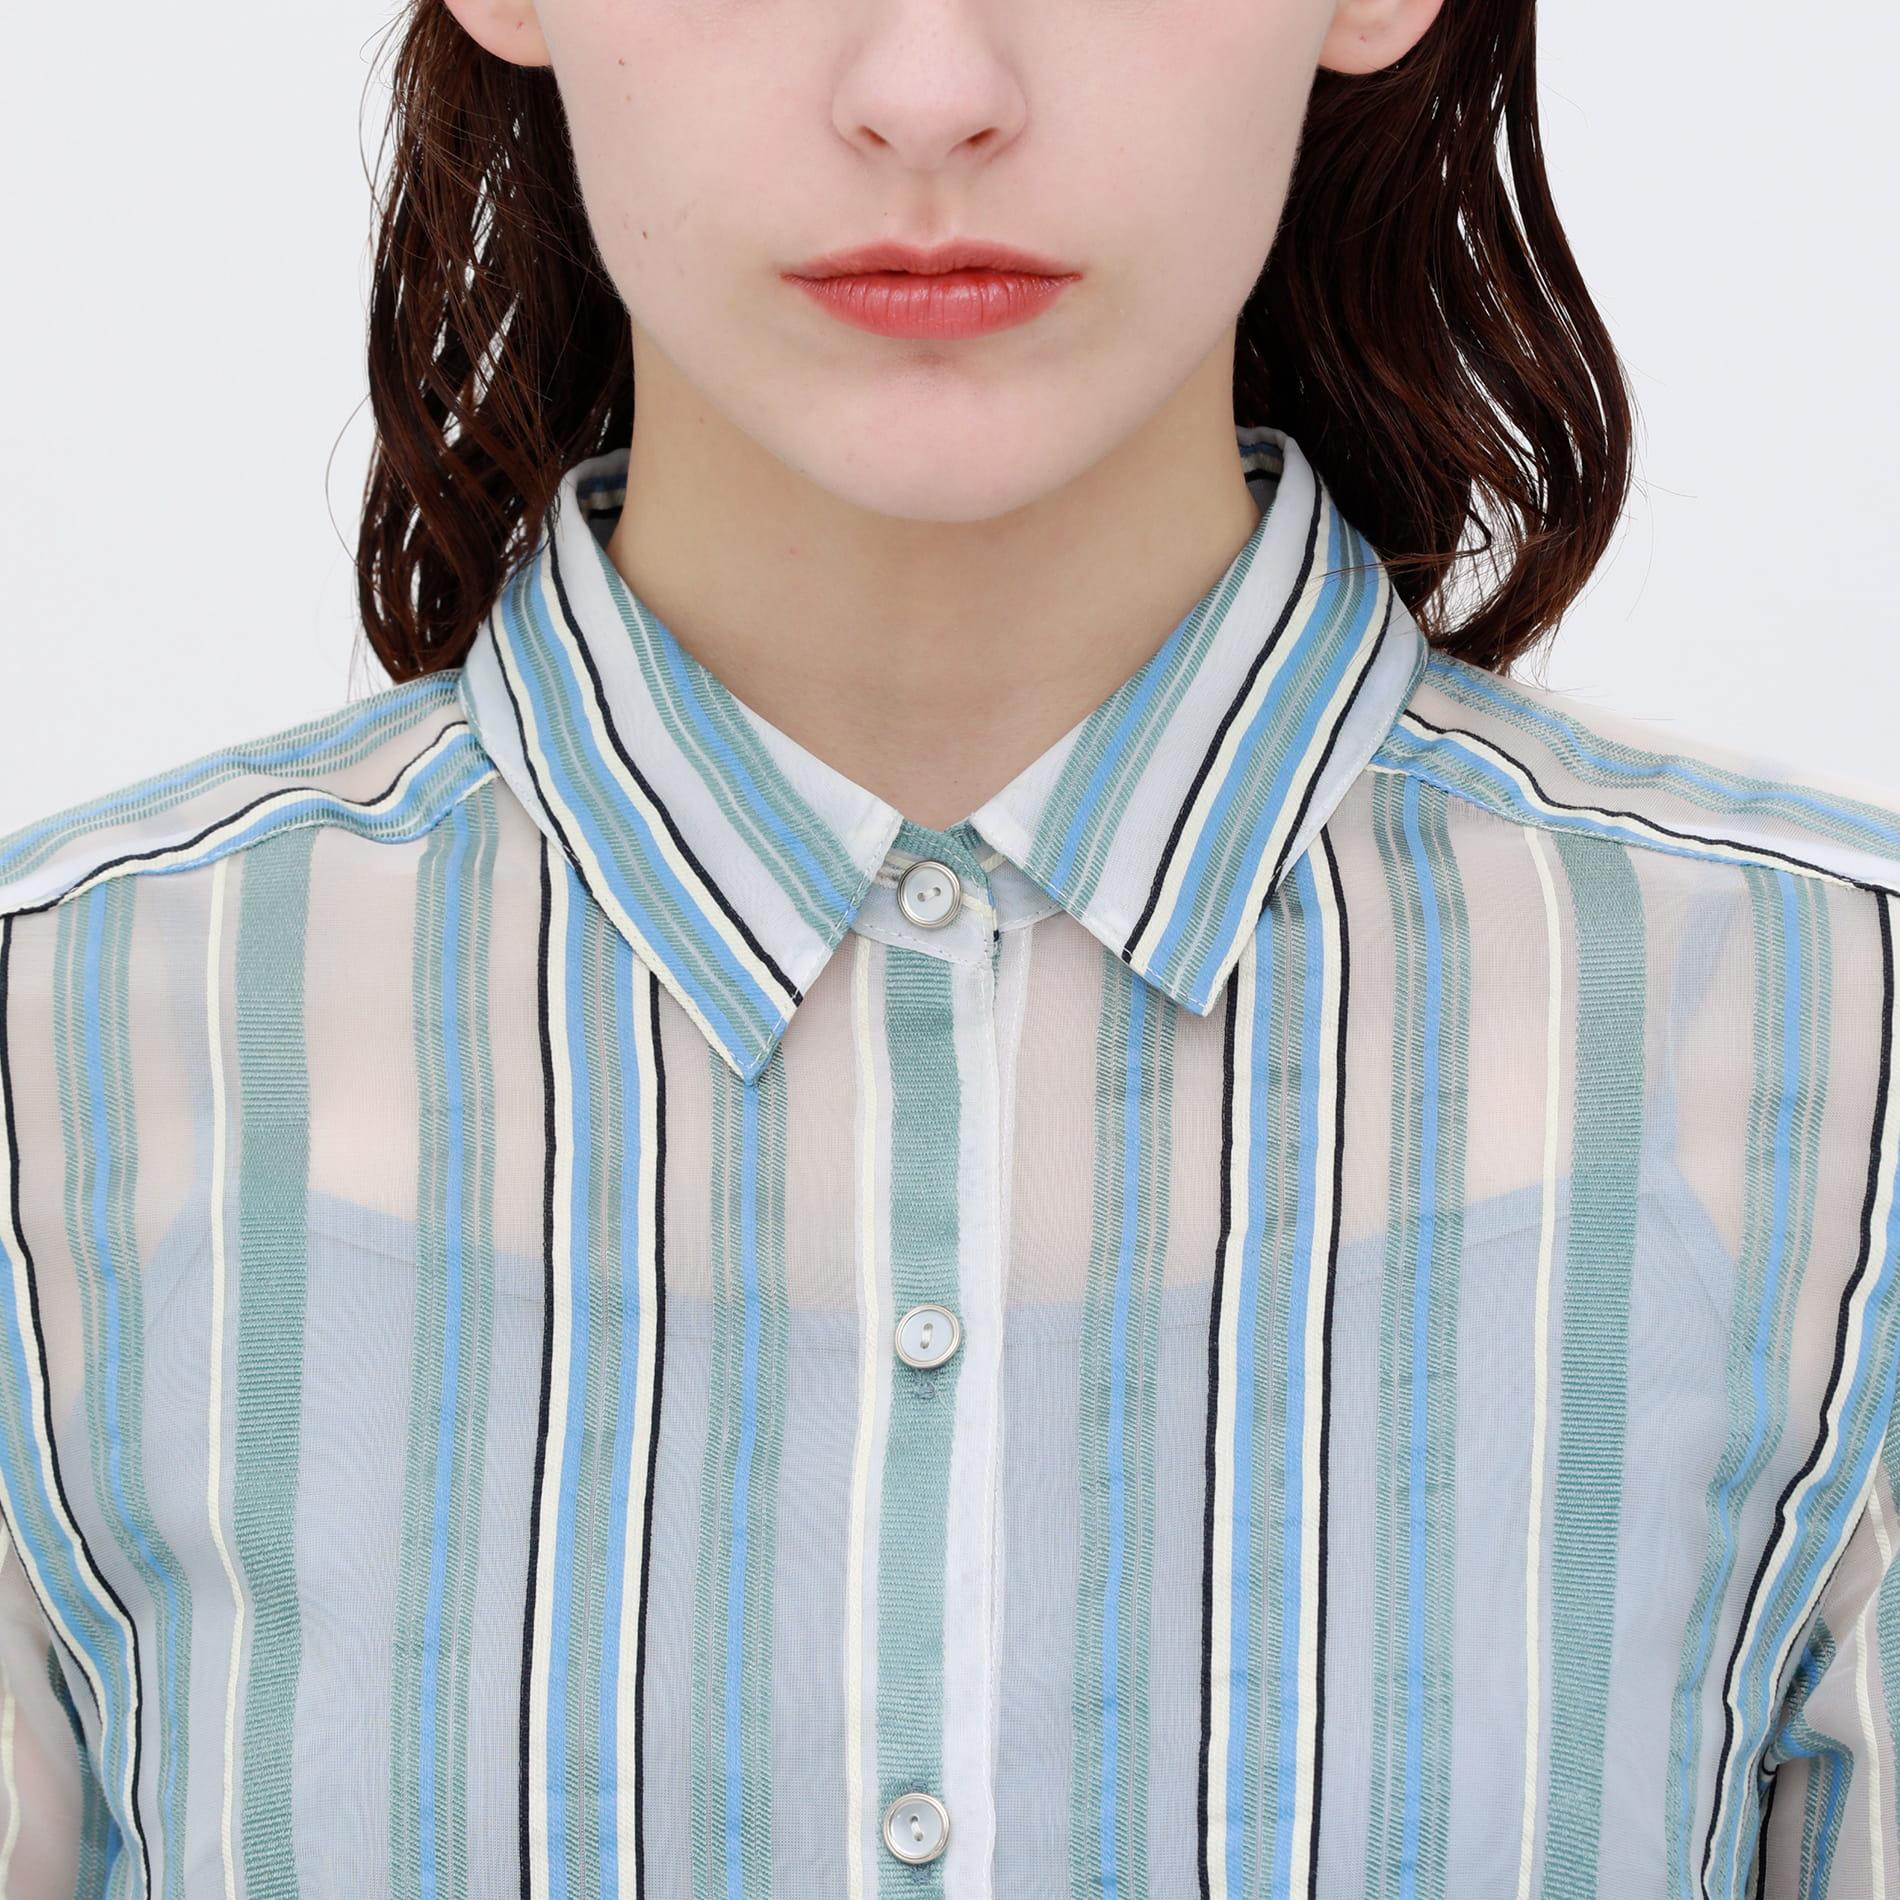 【otona MUSE掲載商品】シアーストライプ ドレス